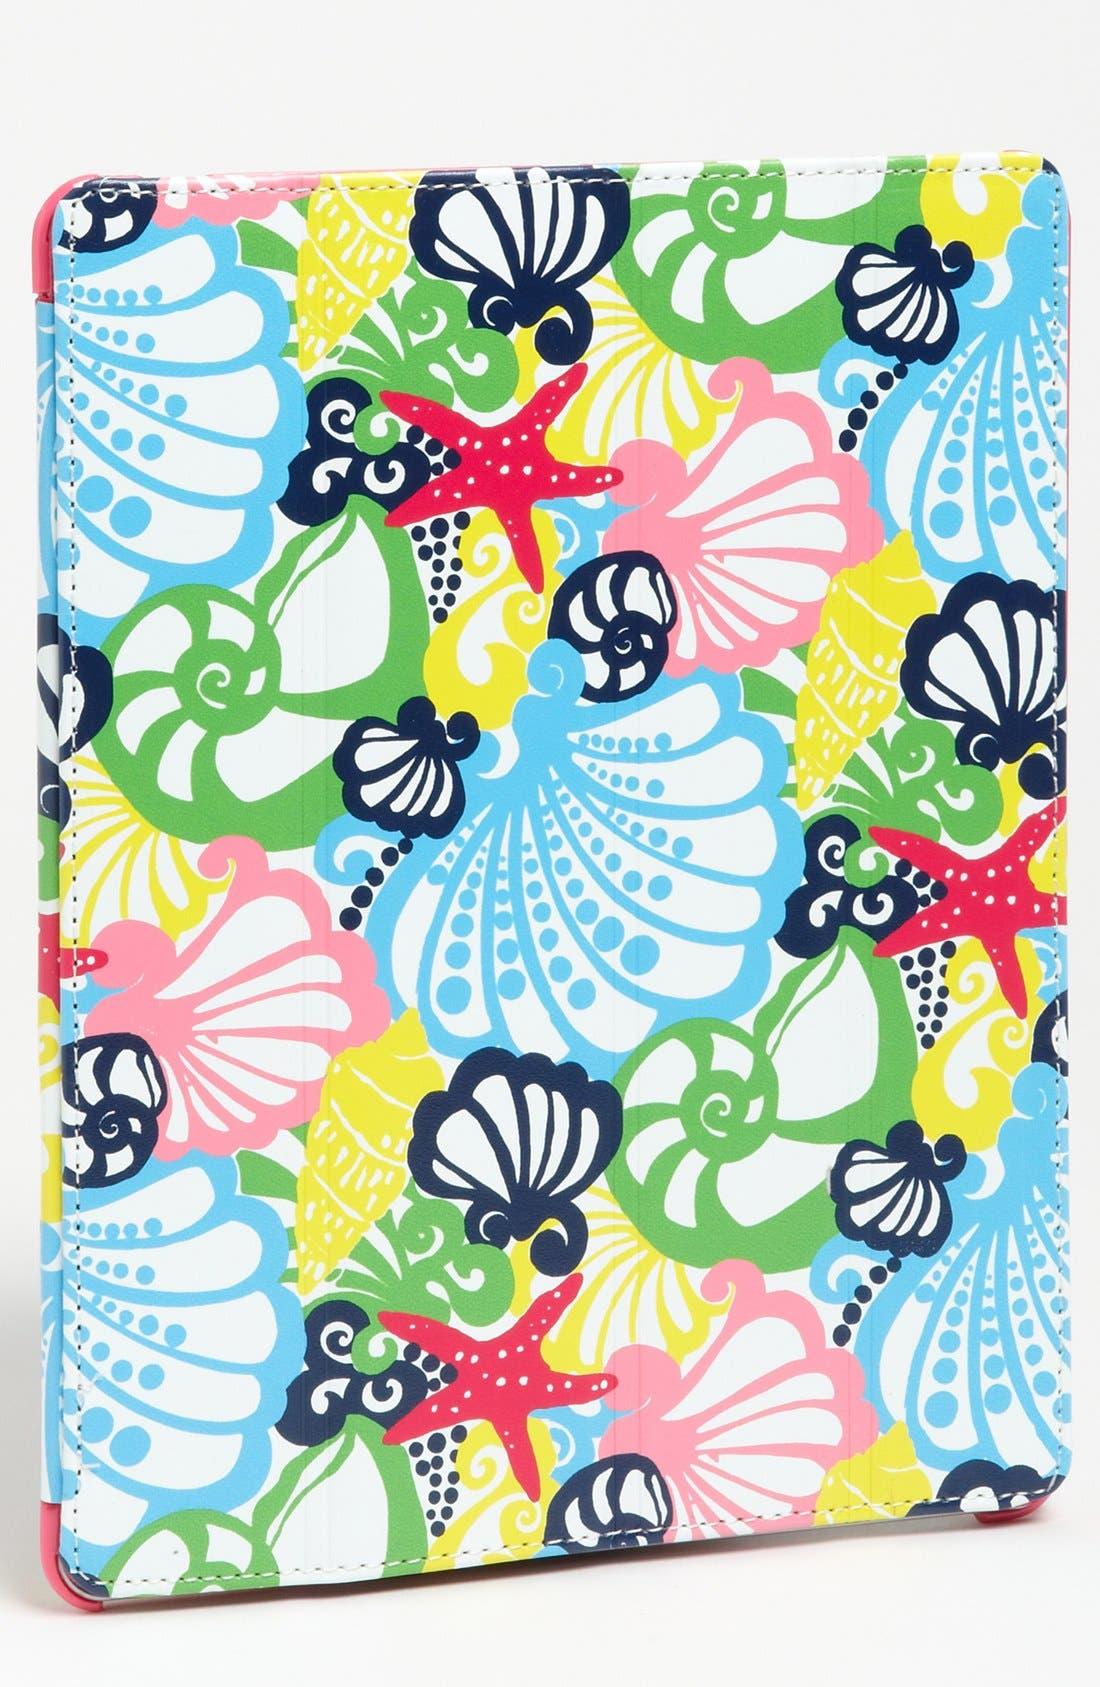 Alternate Image 1 Selected - Lilly Pulitzer® 'Chiquita Bonita' iPad 2 & 3 Case